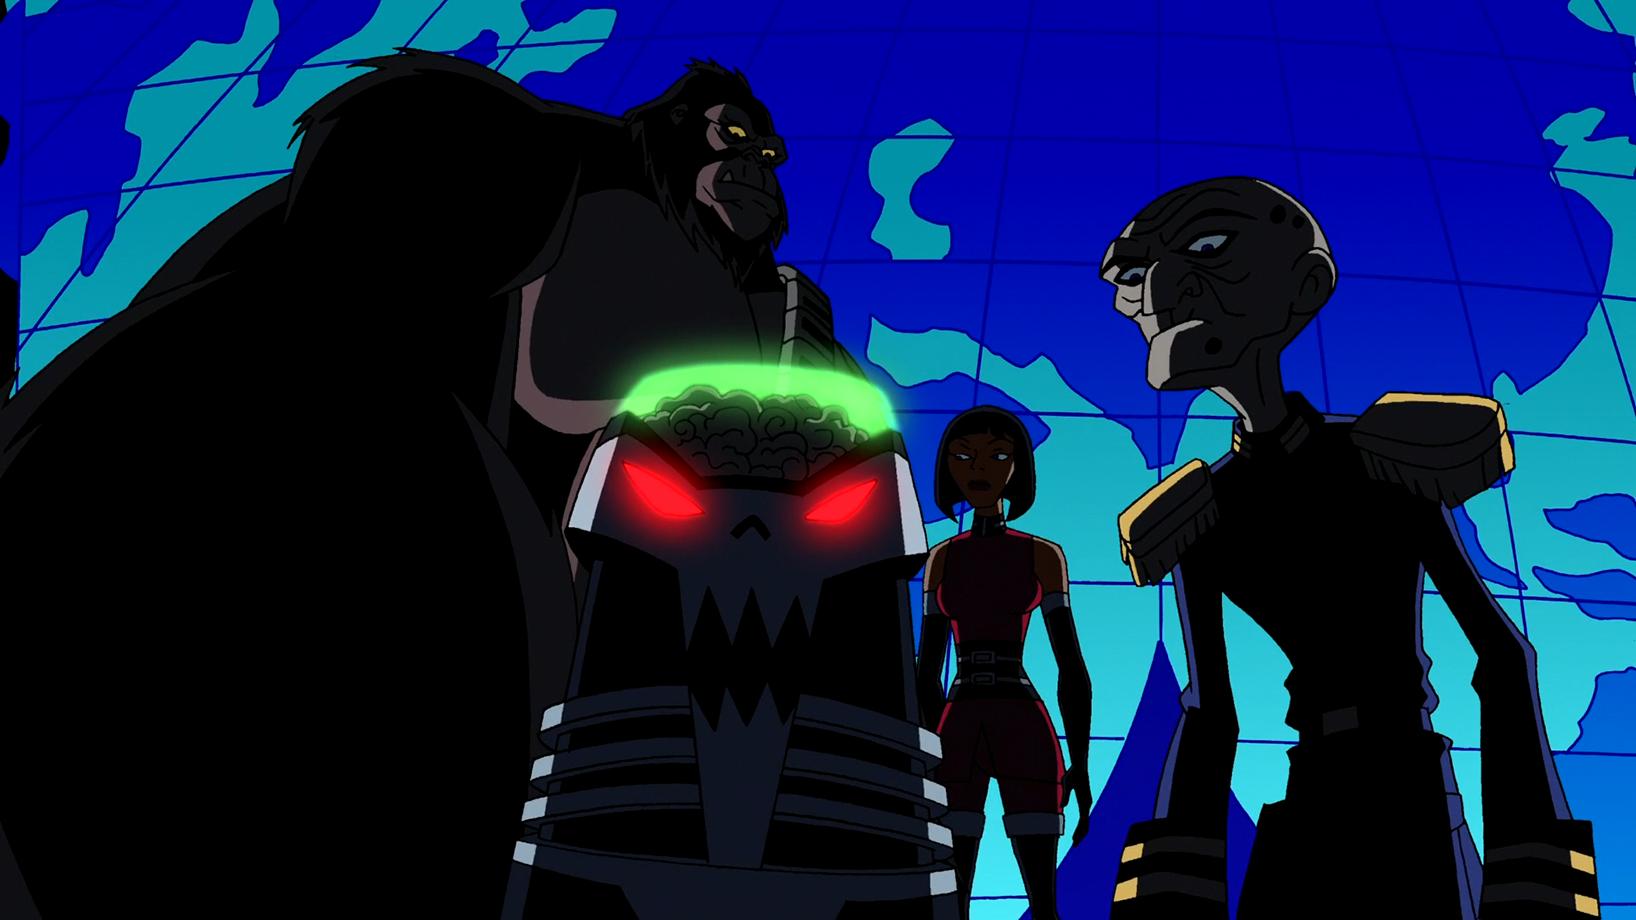 Brotherhood of Evil (Teen Titans TV Series)